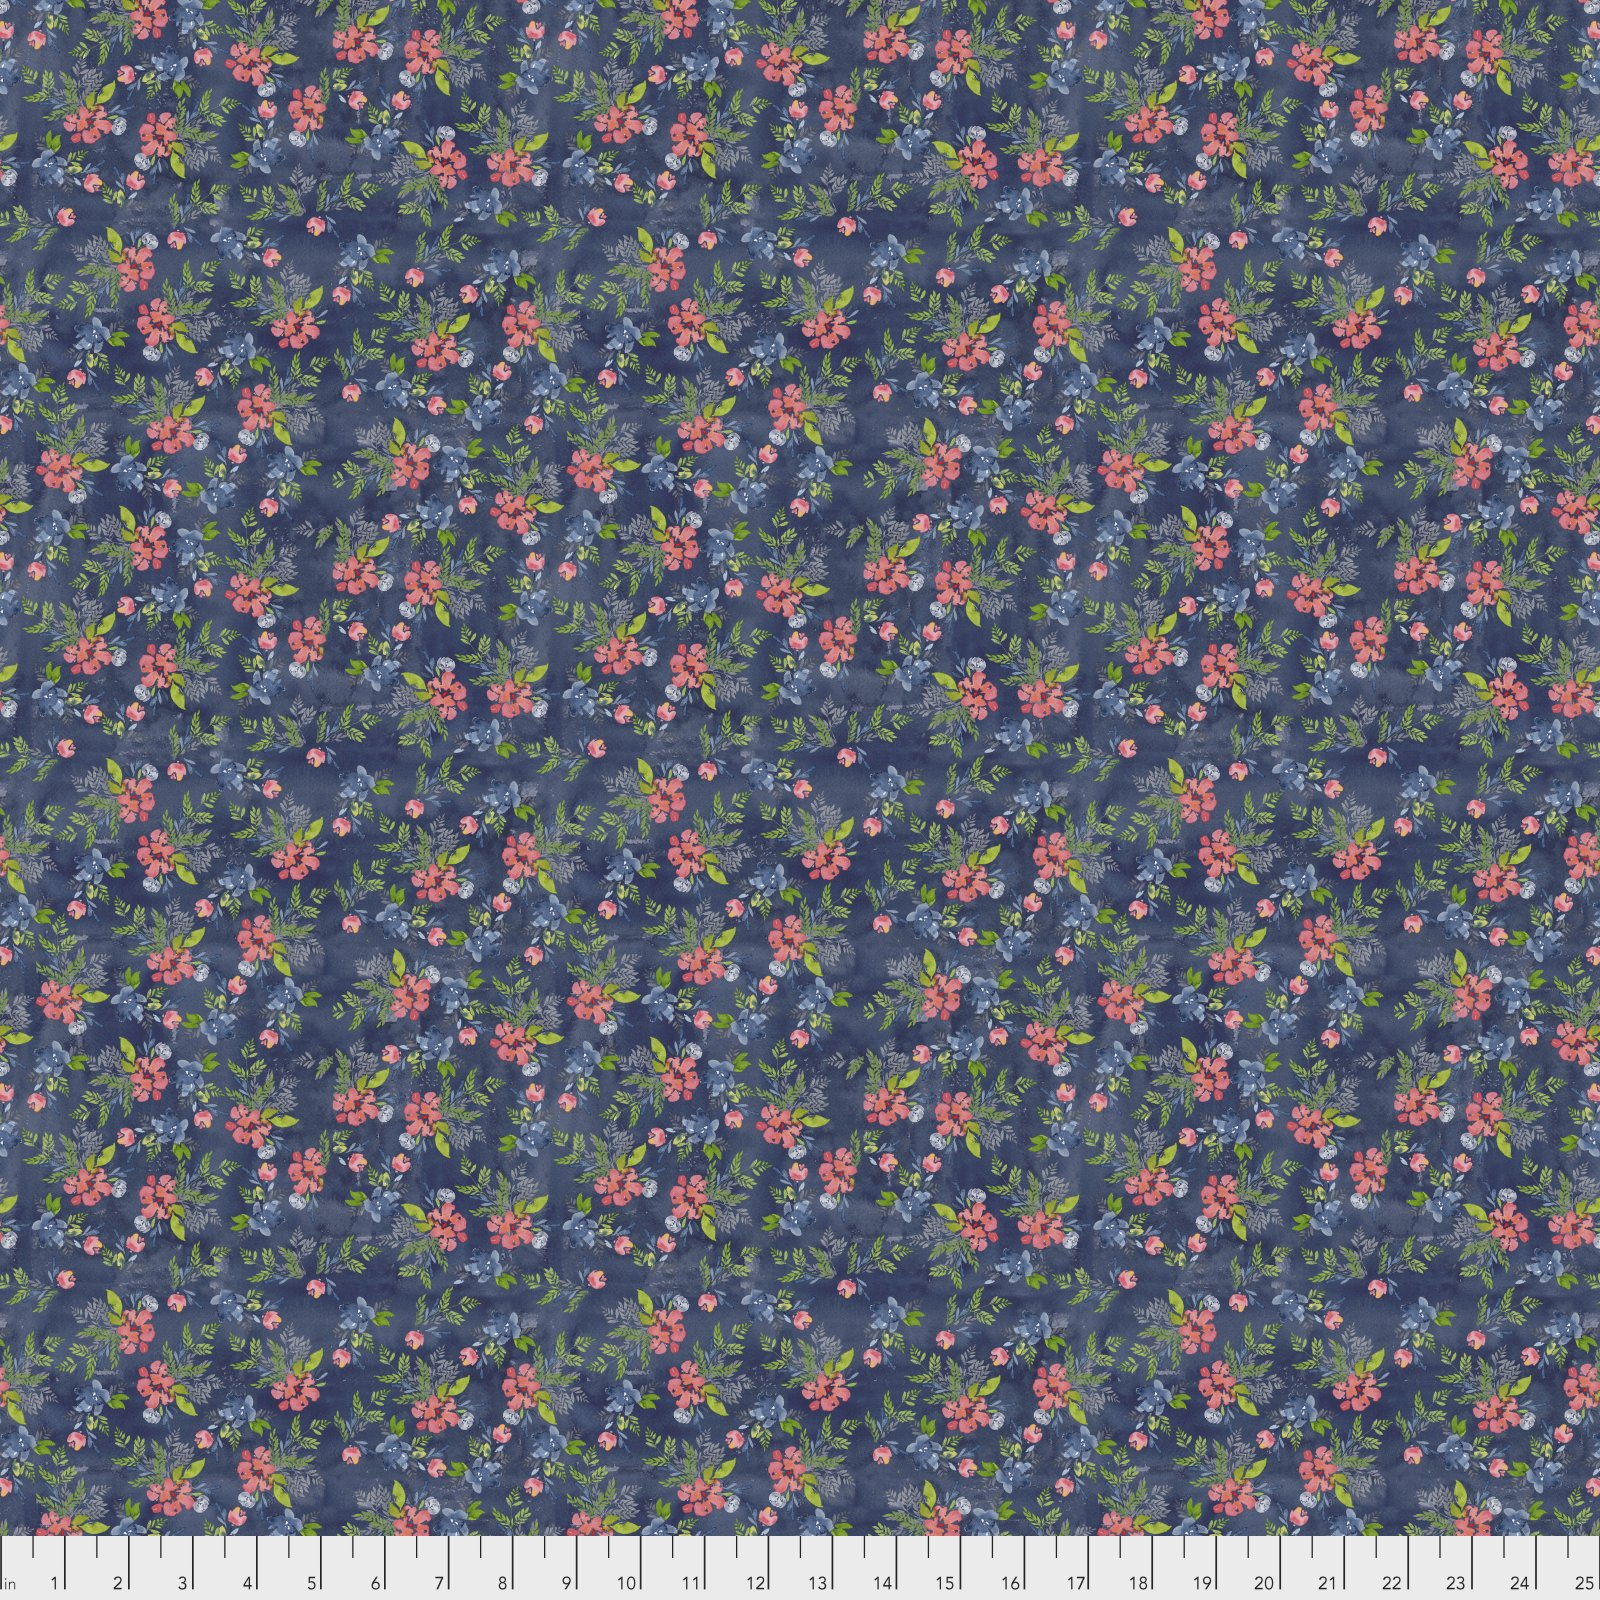 Free Spirit Georgia Blue Digital Print by Natalie Malan PWNM014.NAVYX